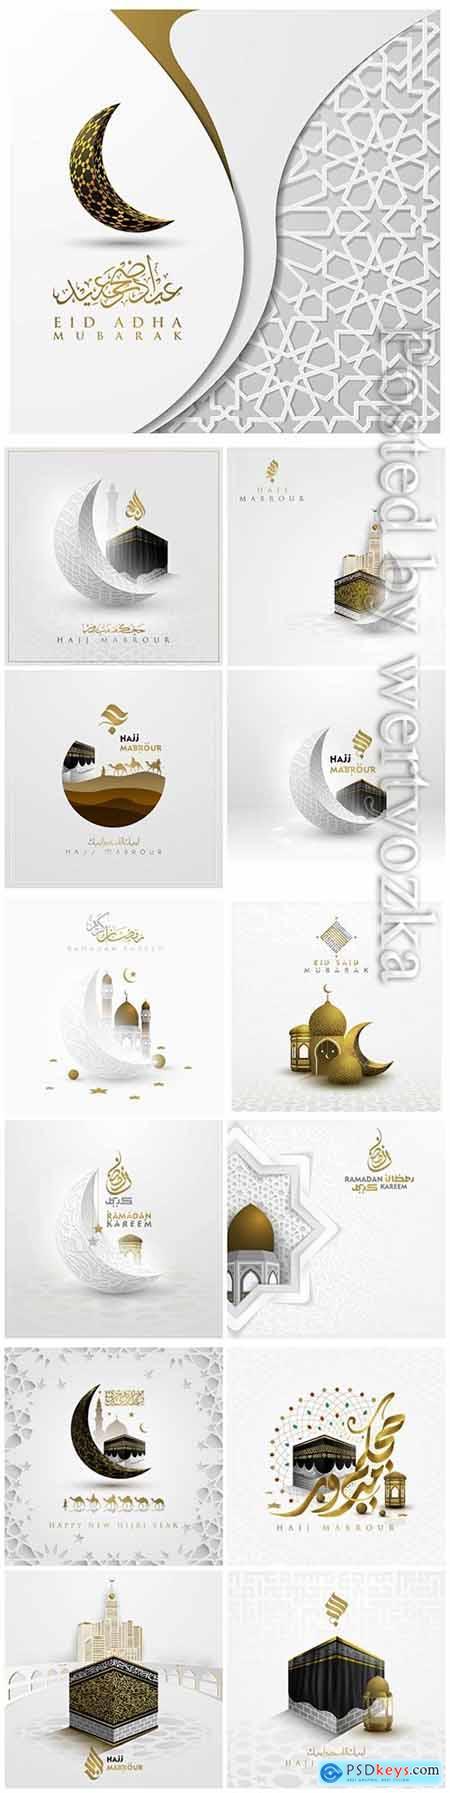 Hajj mabrour greeting islamic illustration background design with beautiful kaaba lentern